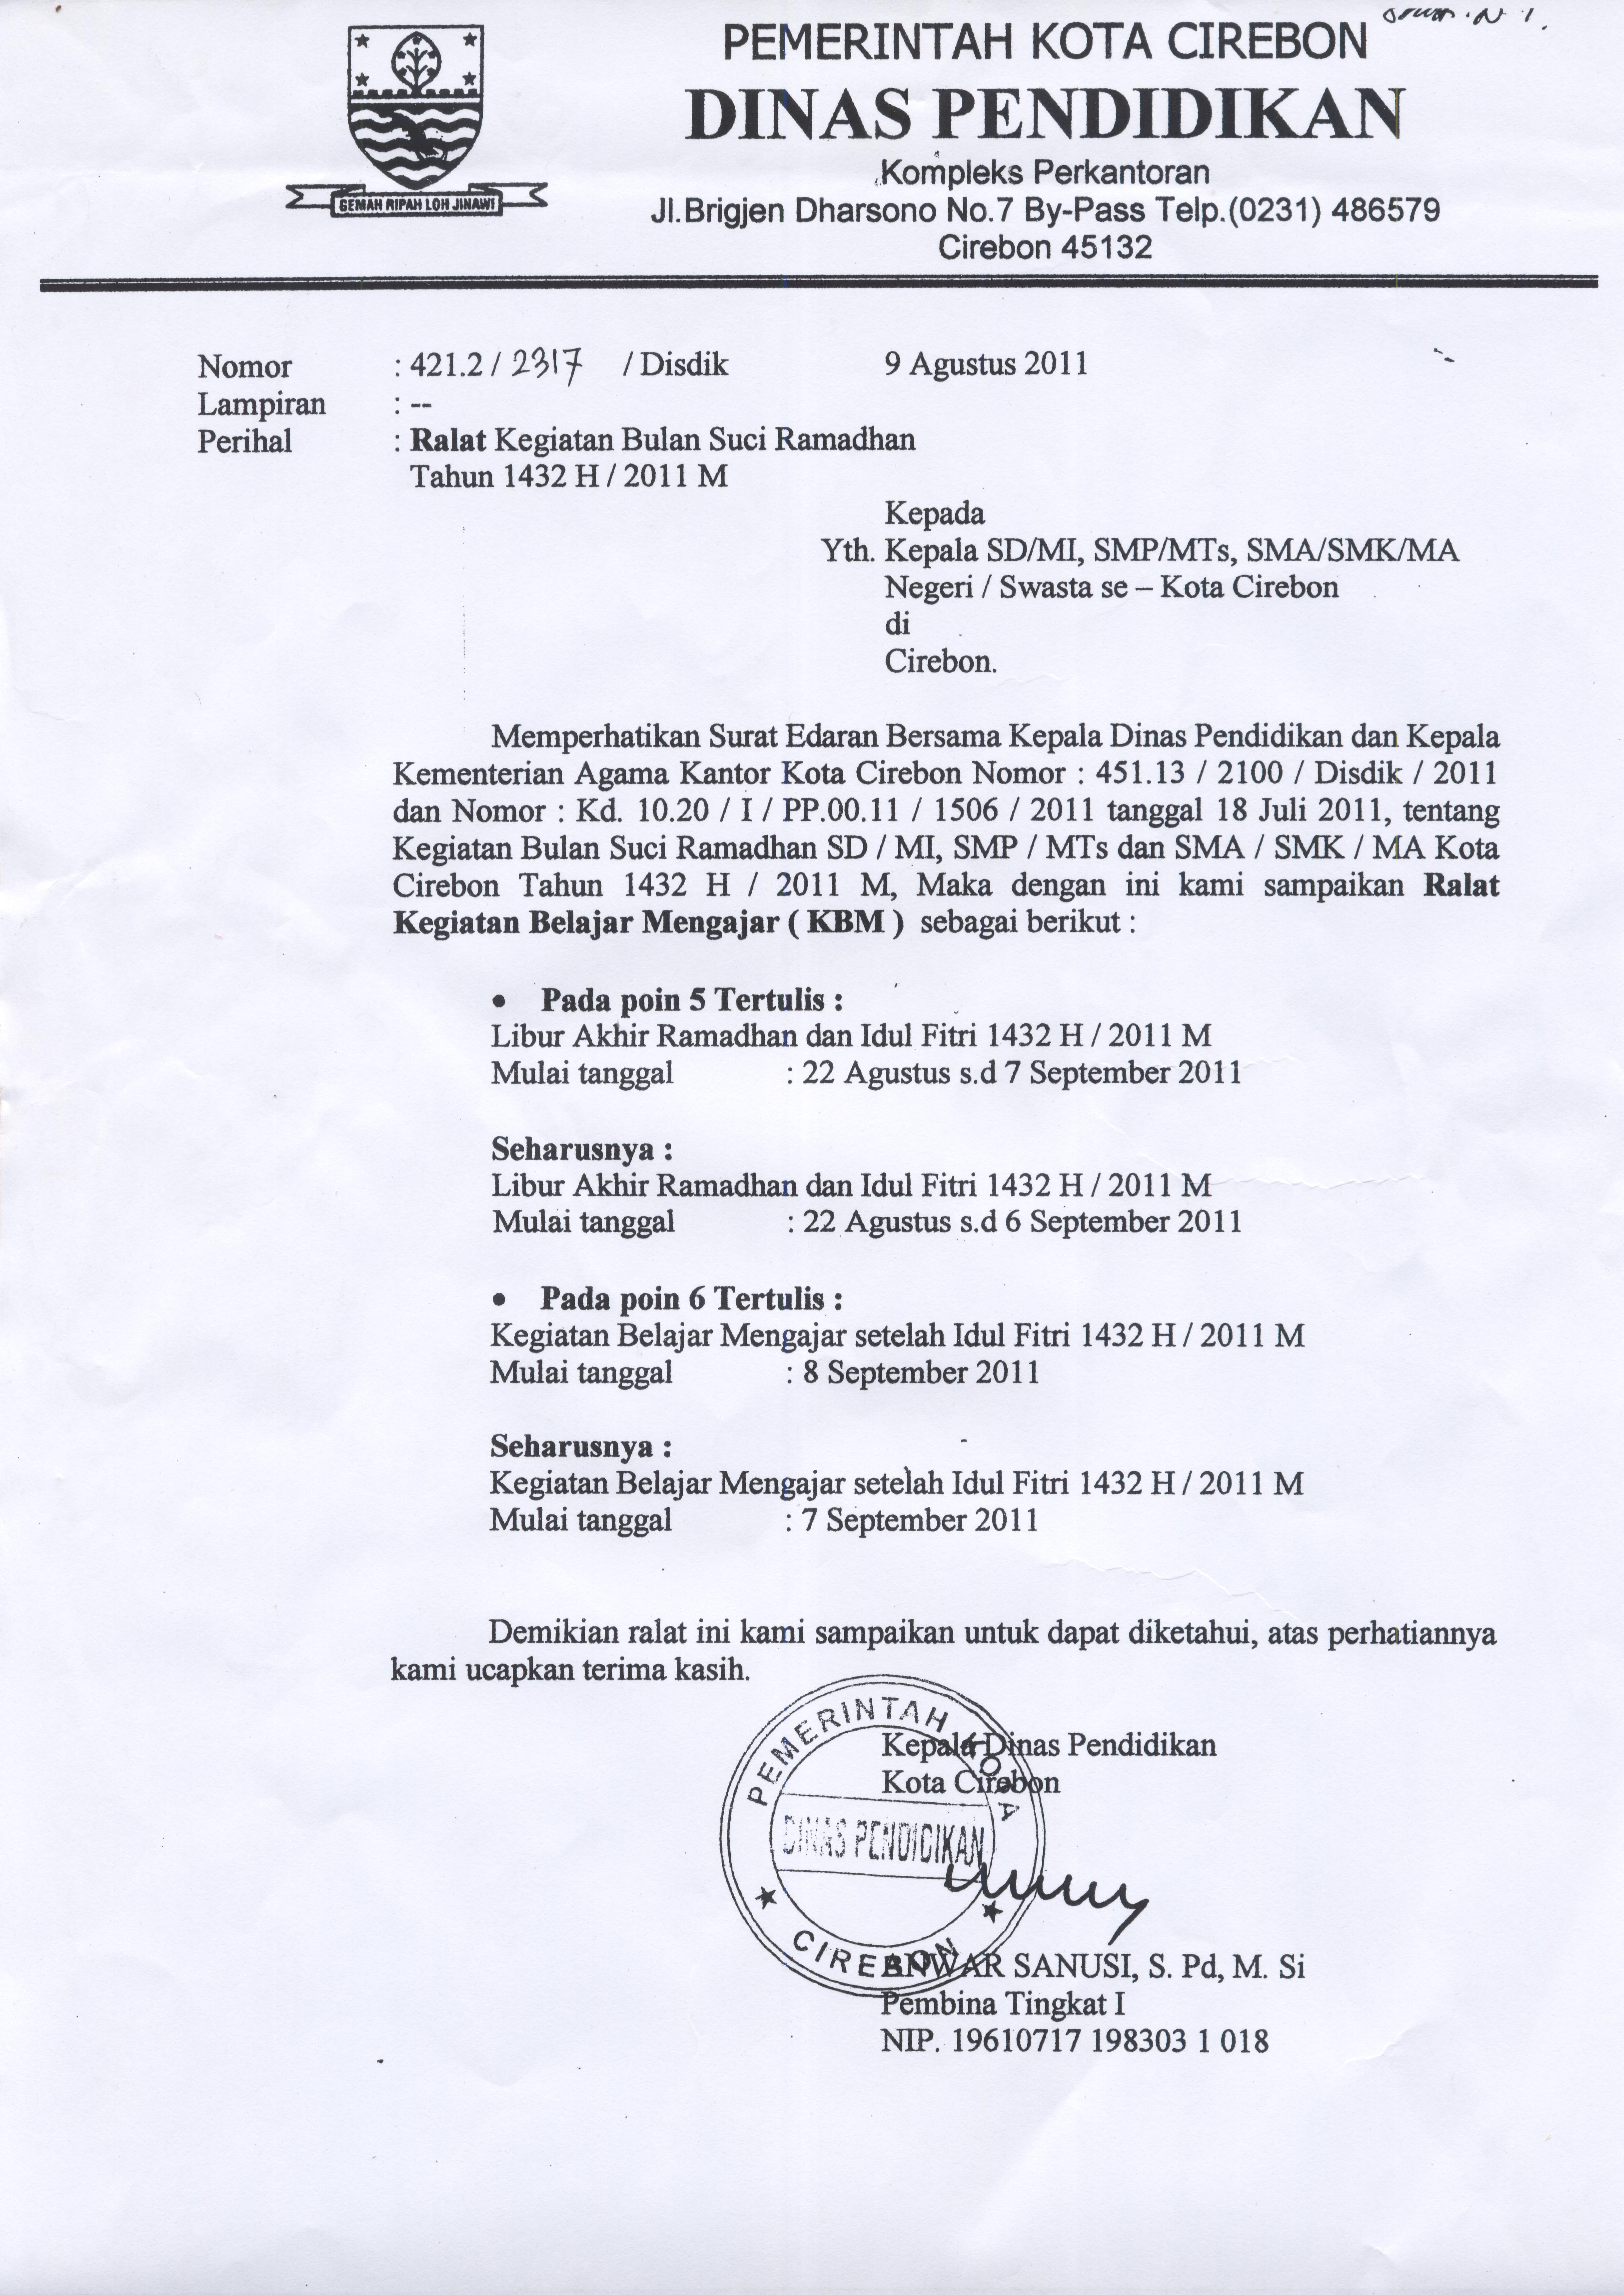 Surat Ralat Kegiatan Bulan Suci Ramadhan 1432 H 2011 M